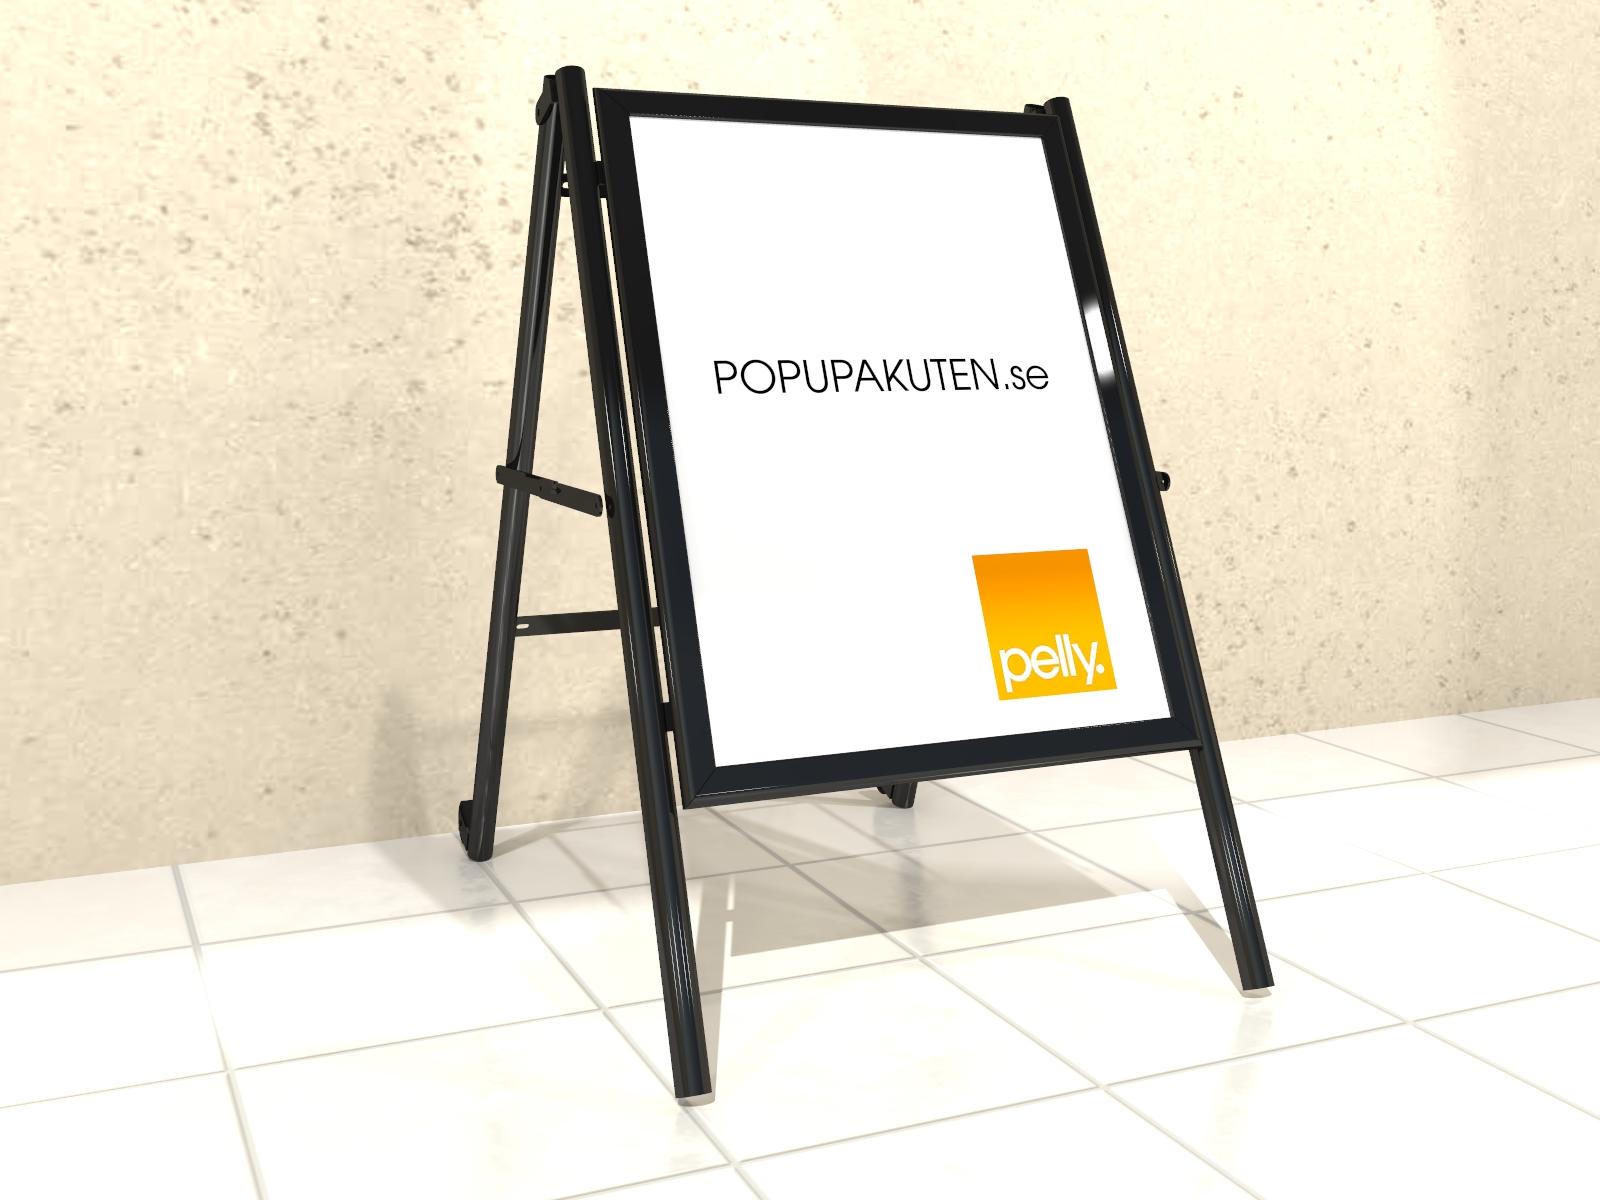 popupakuten_Profil skylt för trottoarpratare